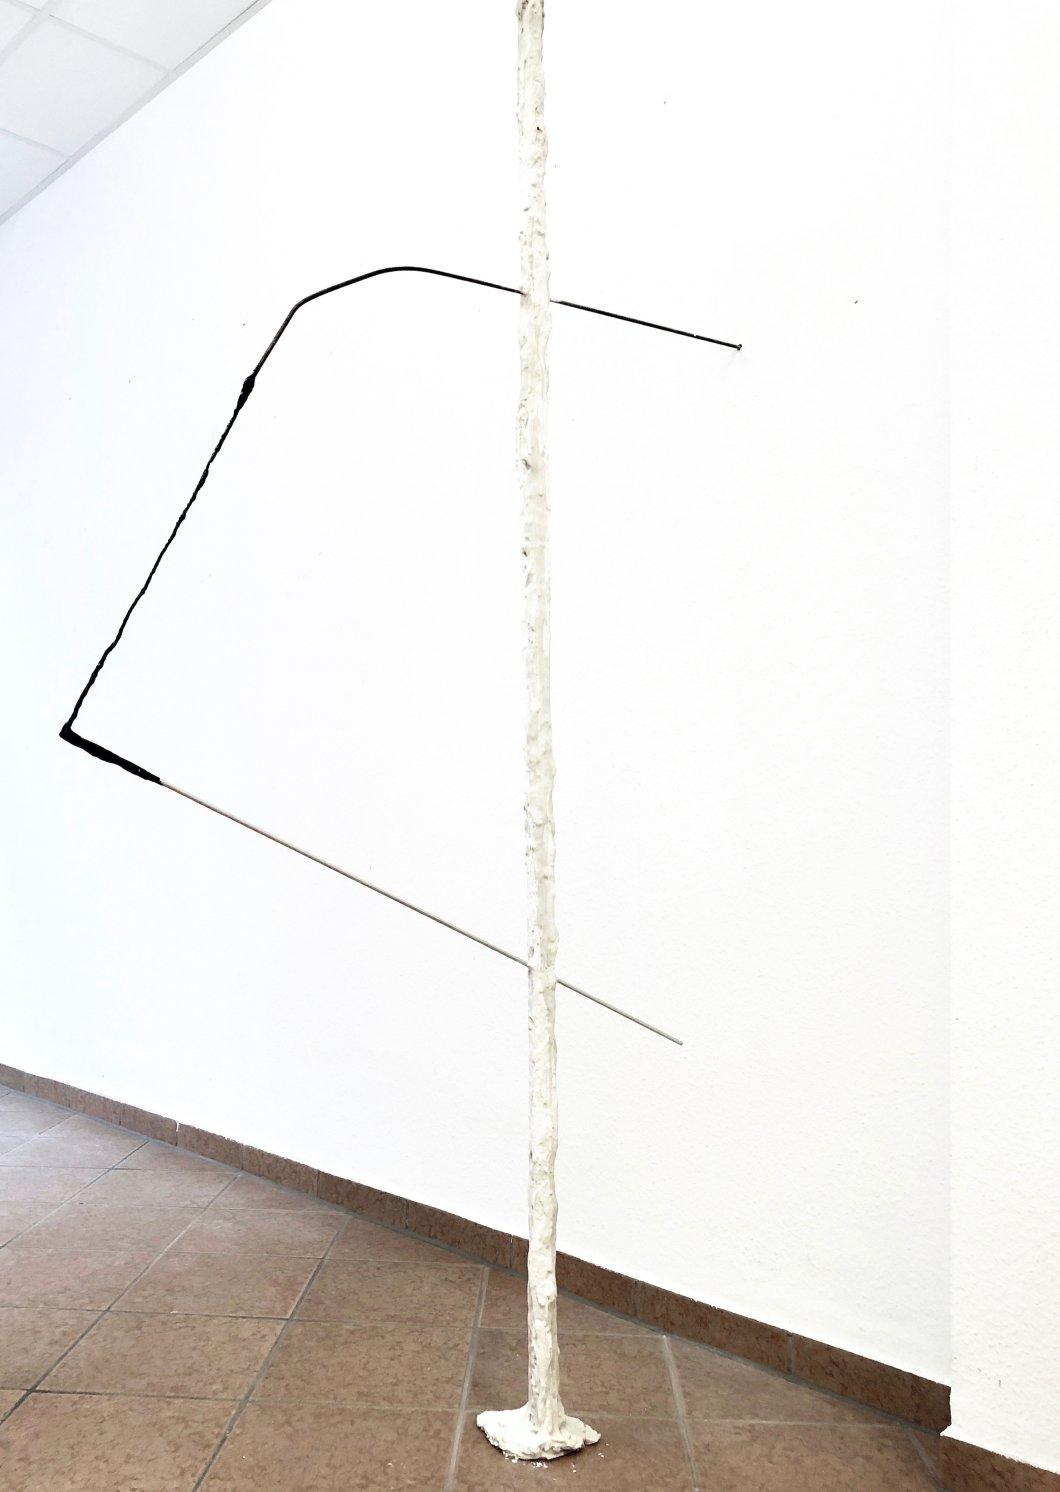 cuatro parámetros (2019) - Karla Paredes de Krentel - Karla Paredes K.